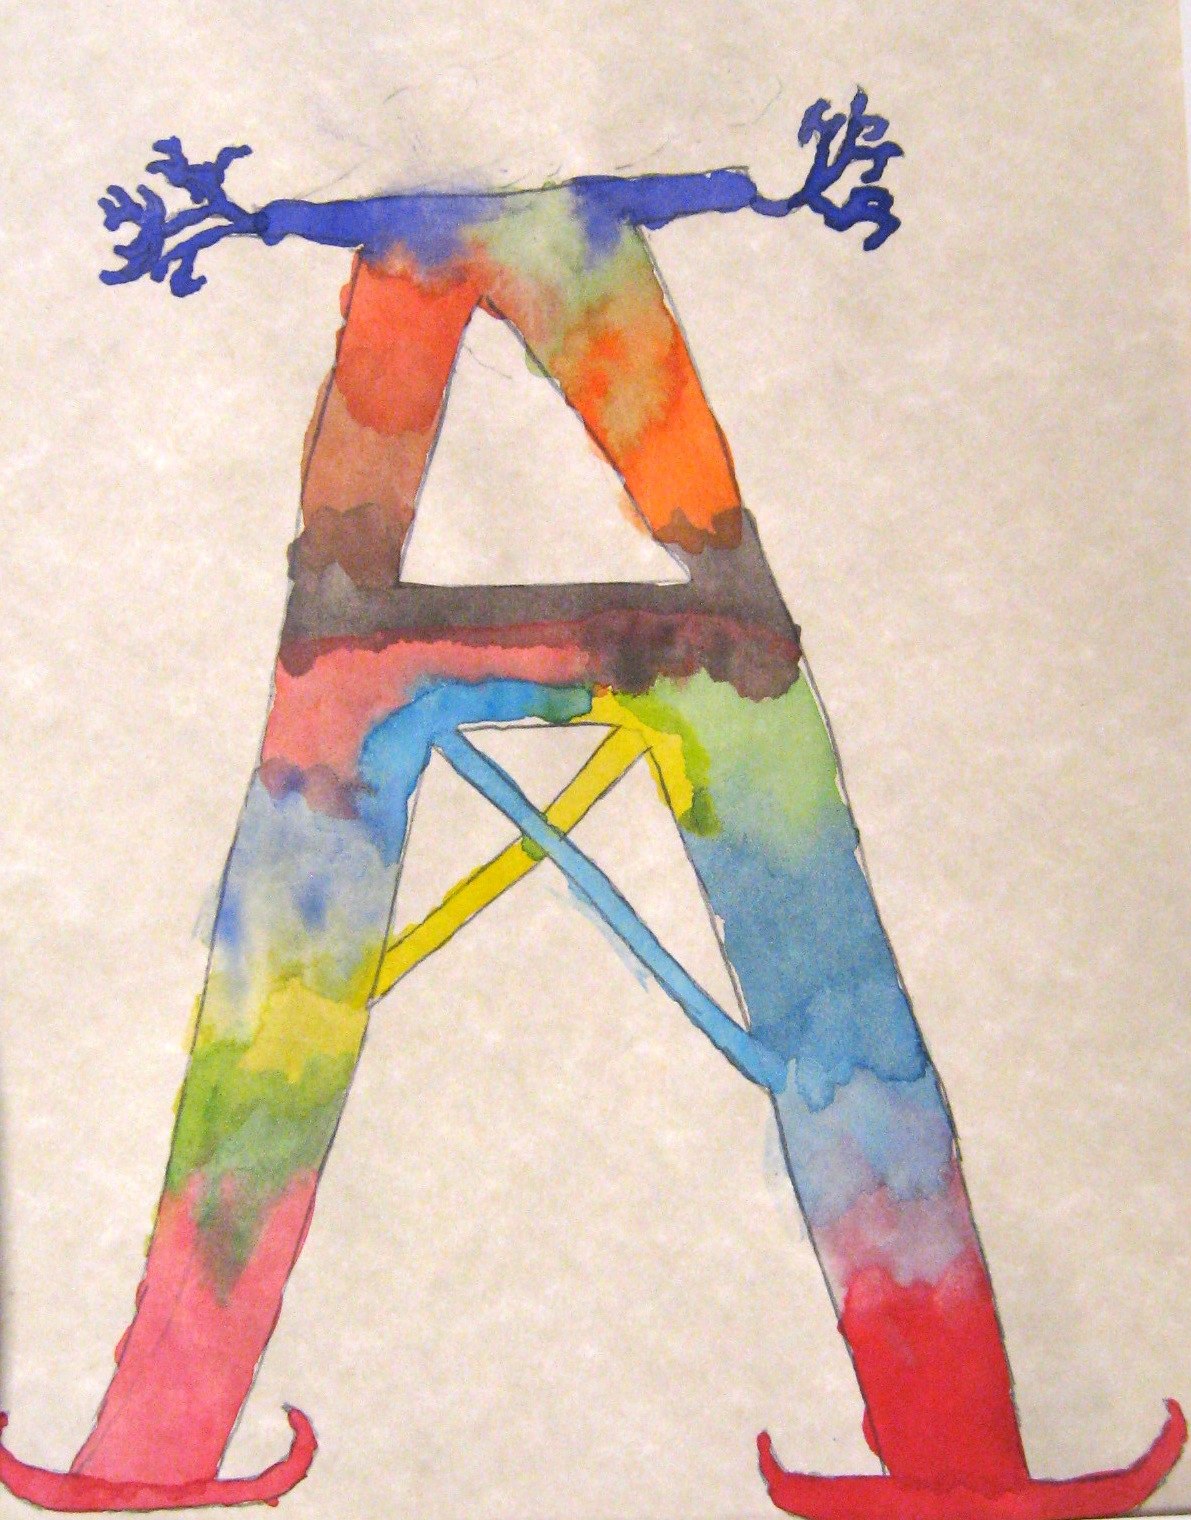 Illuminated Letters Art Project